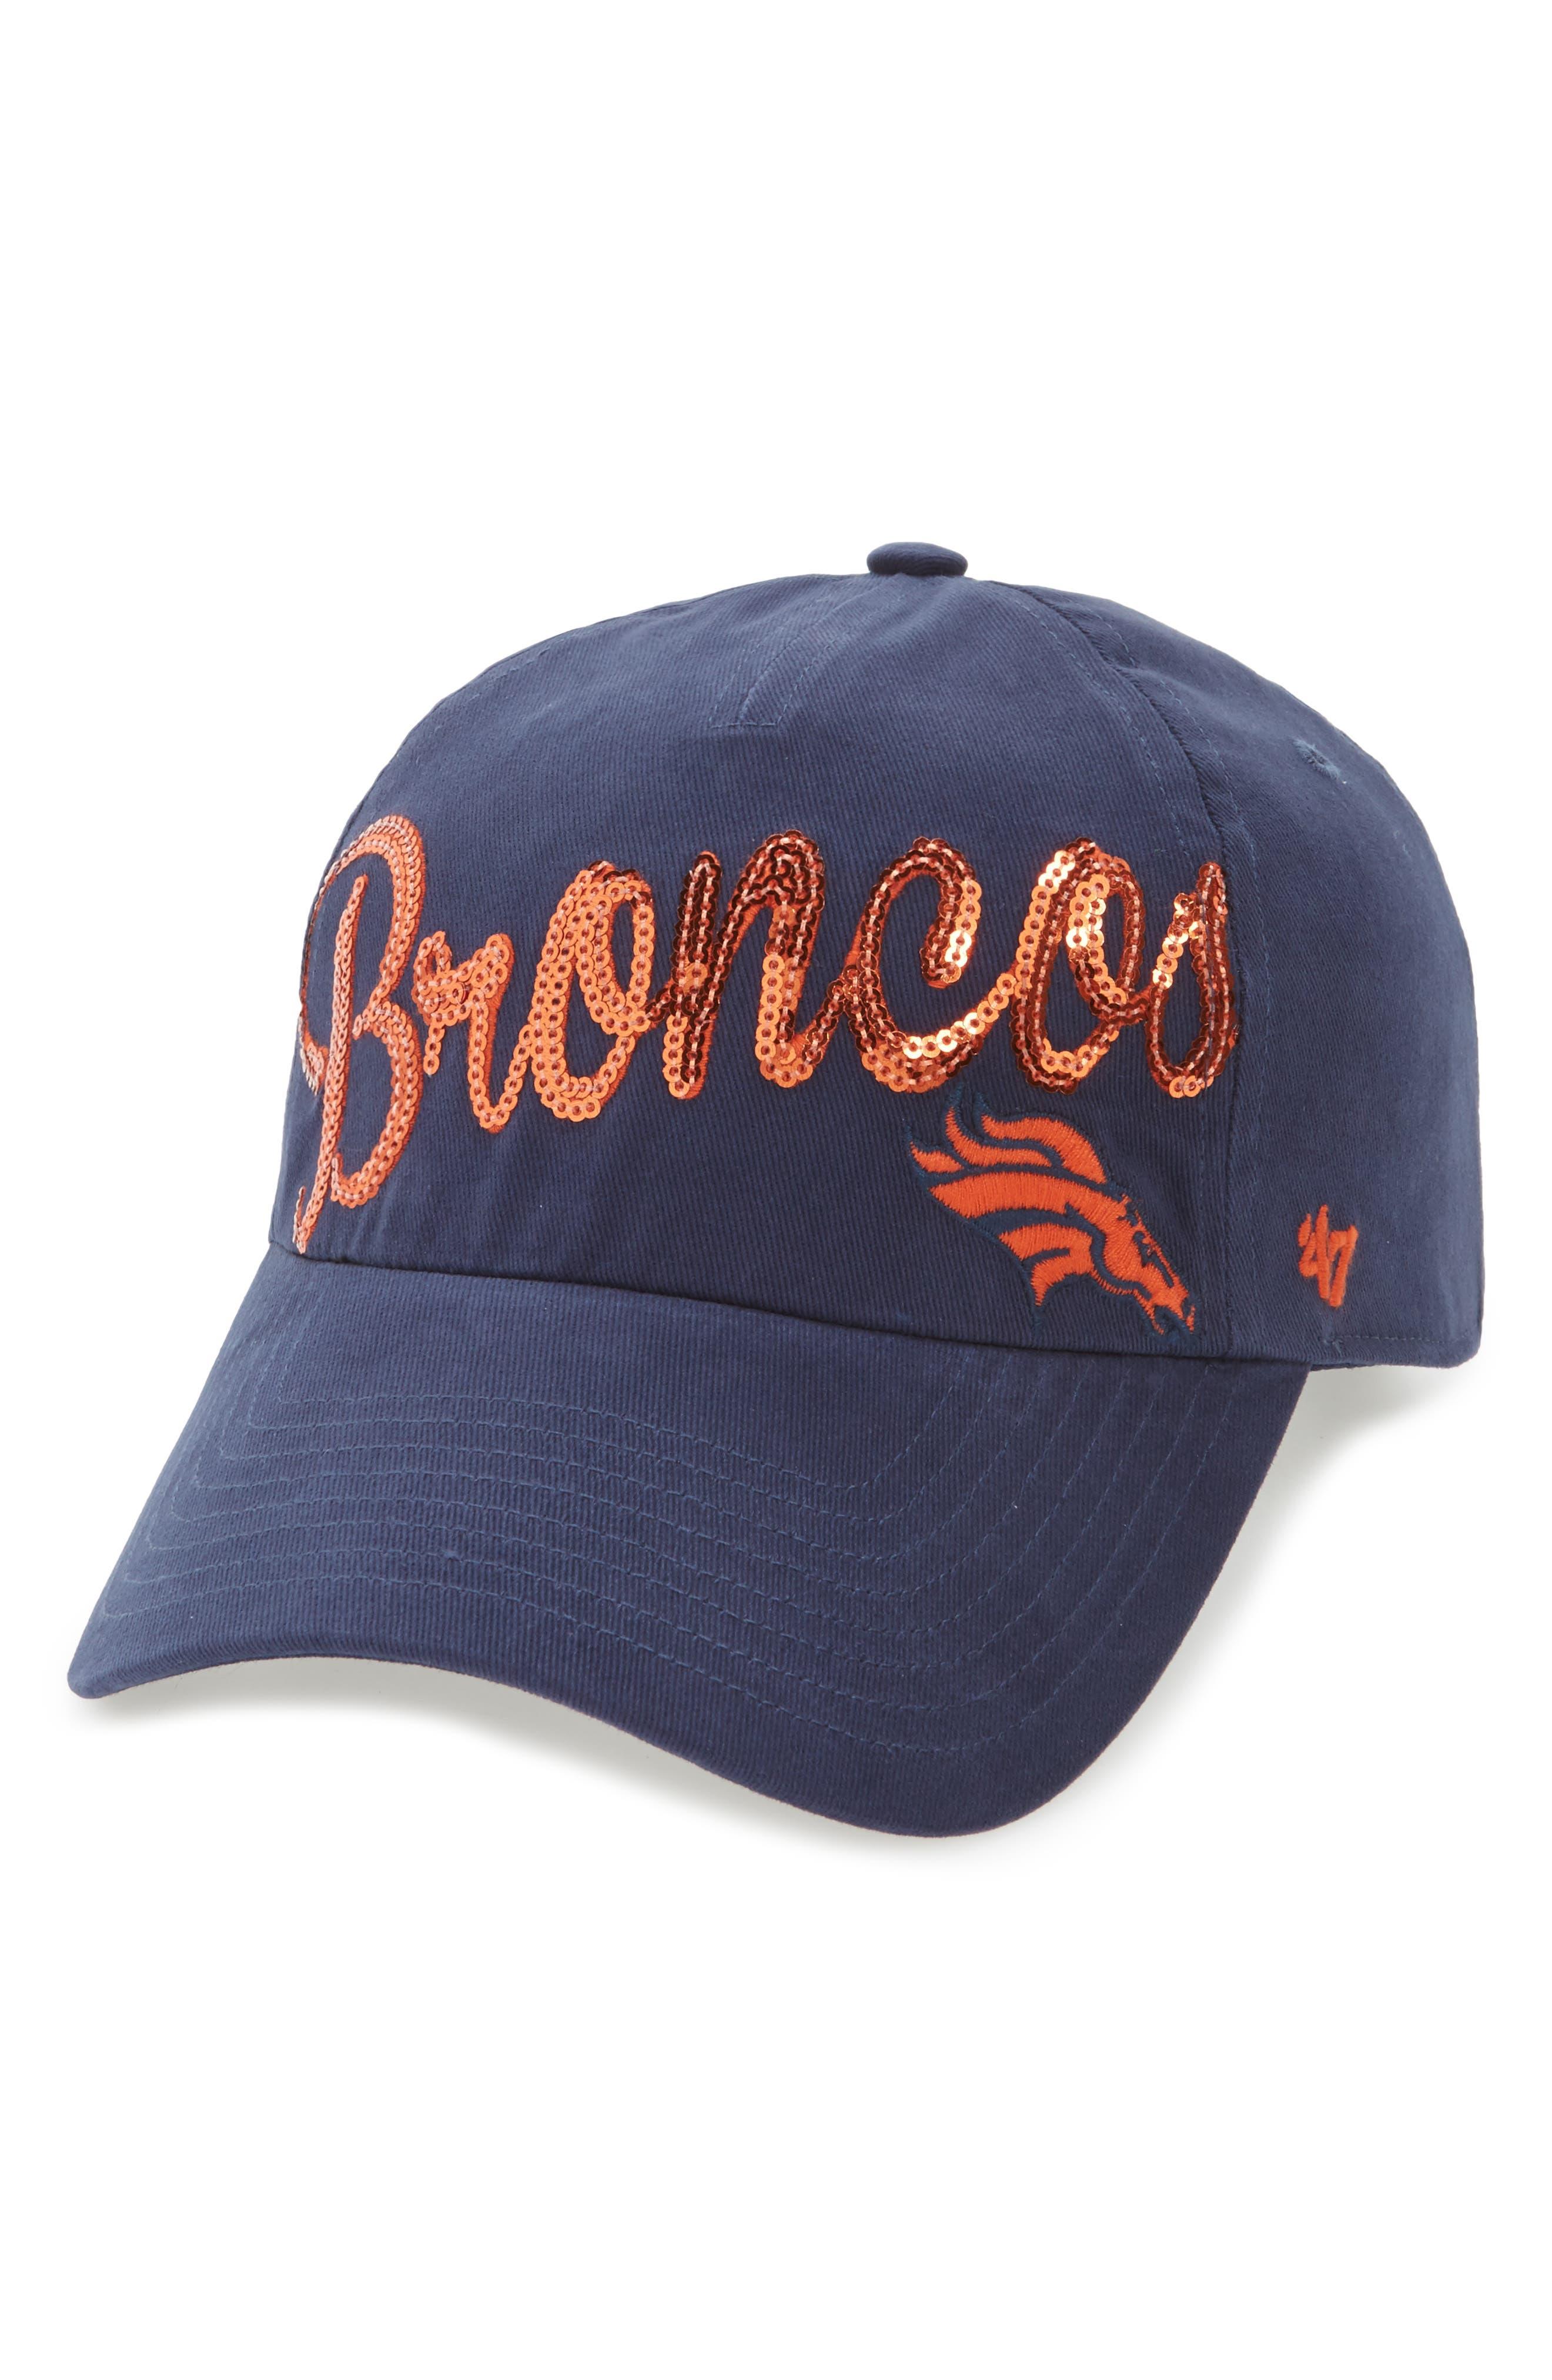 Denver Broncos Sparkle Cap,                         Main,                         color, 410